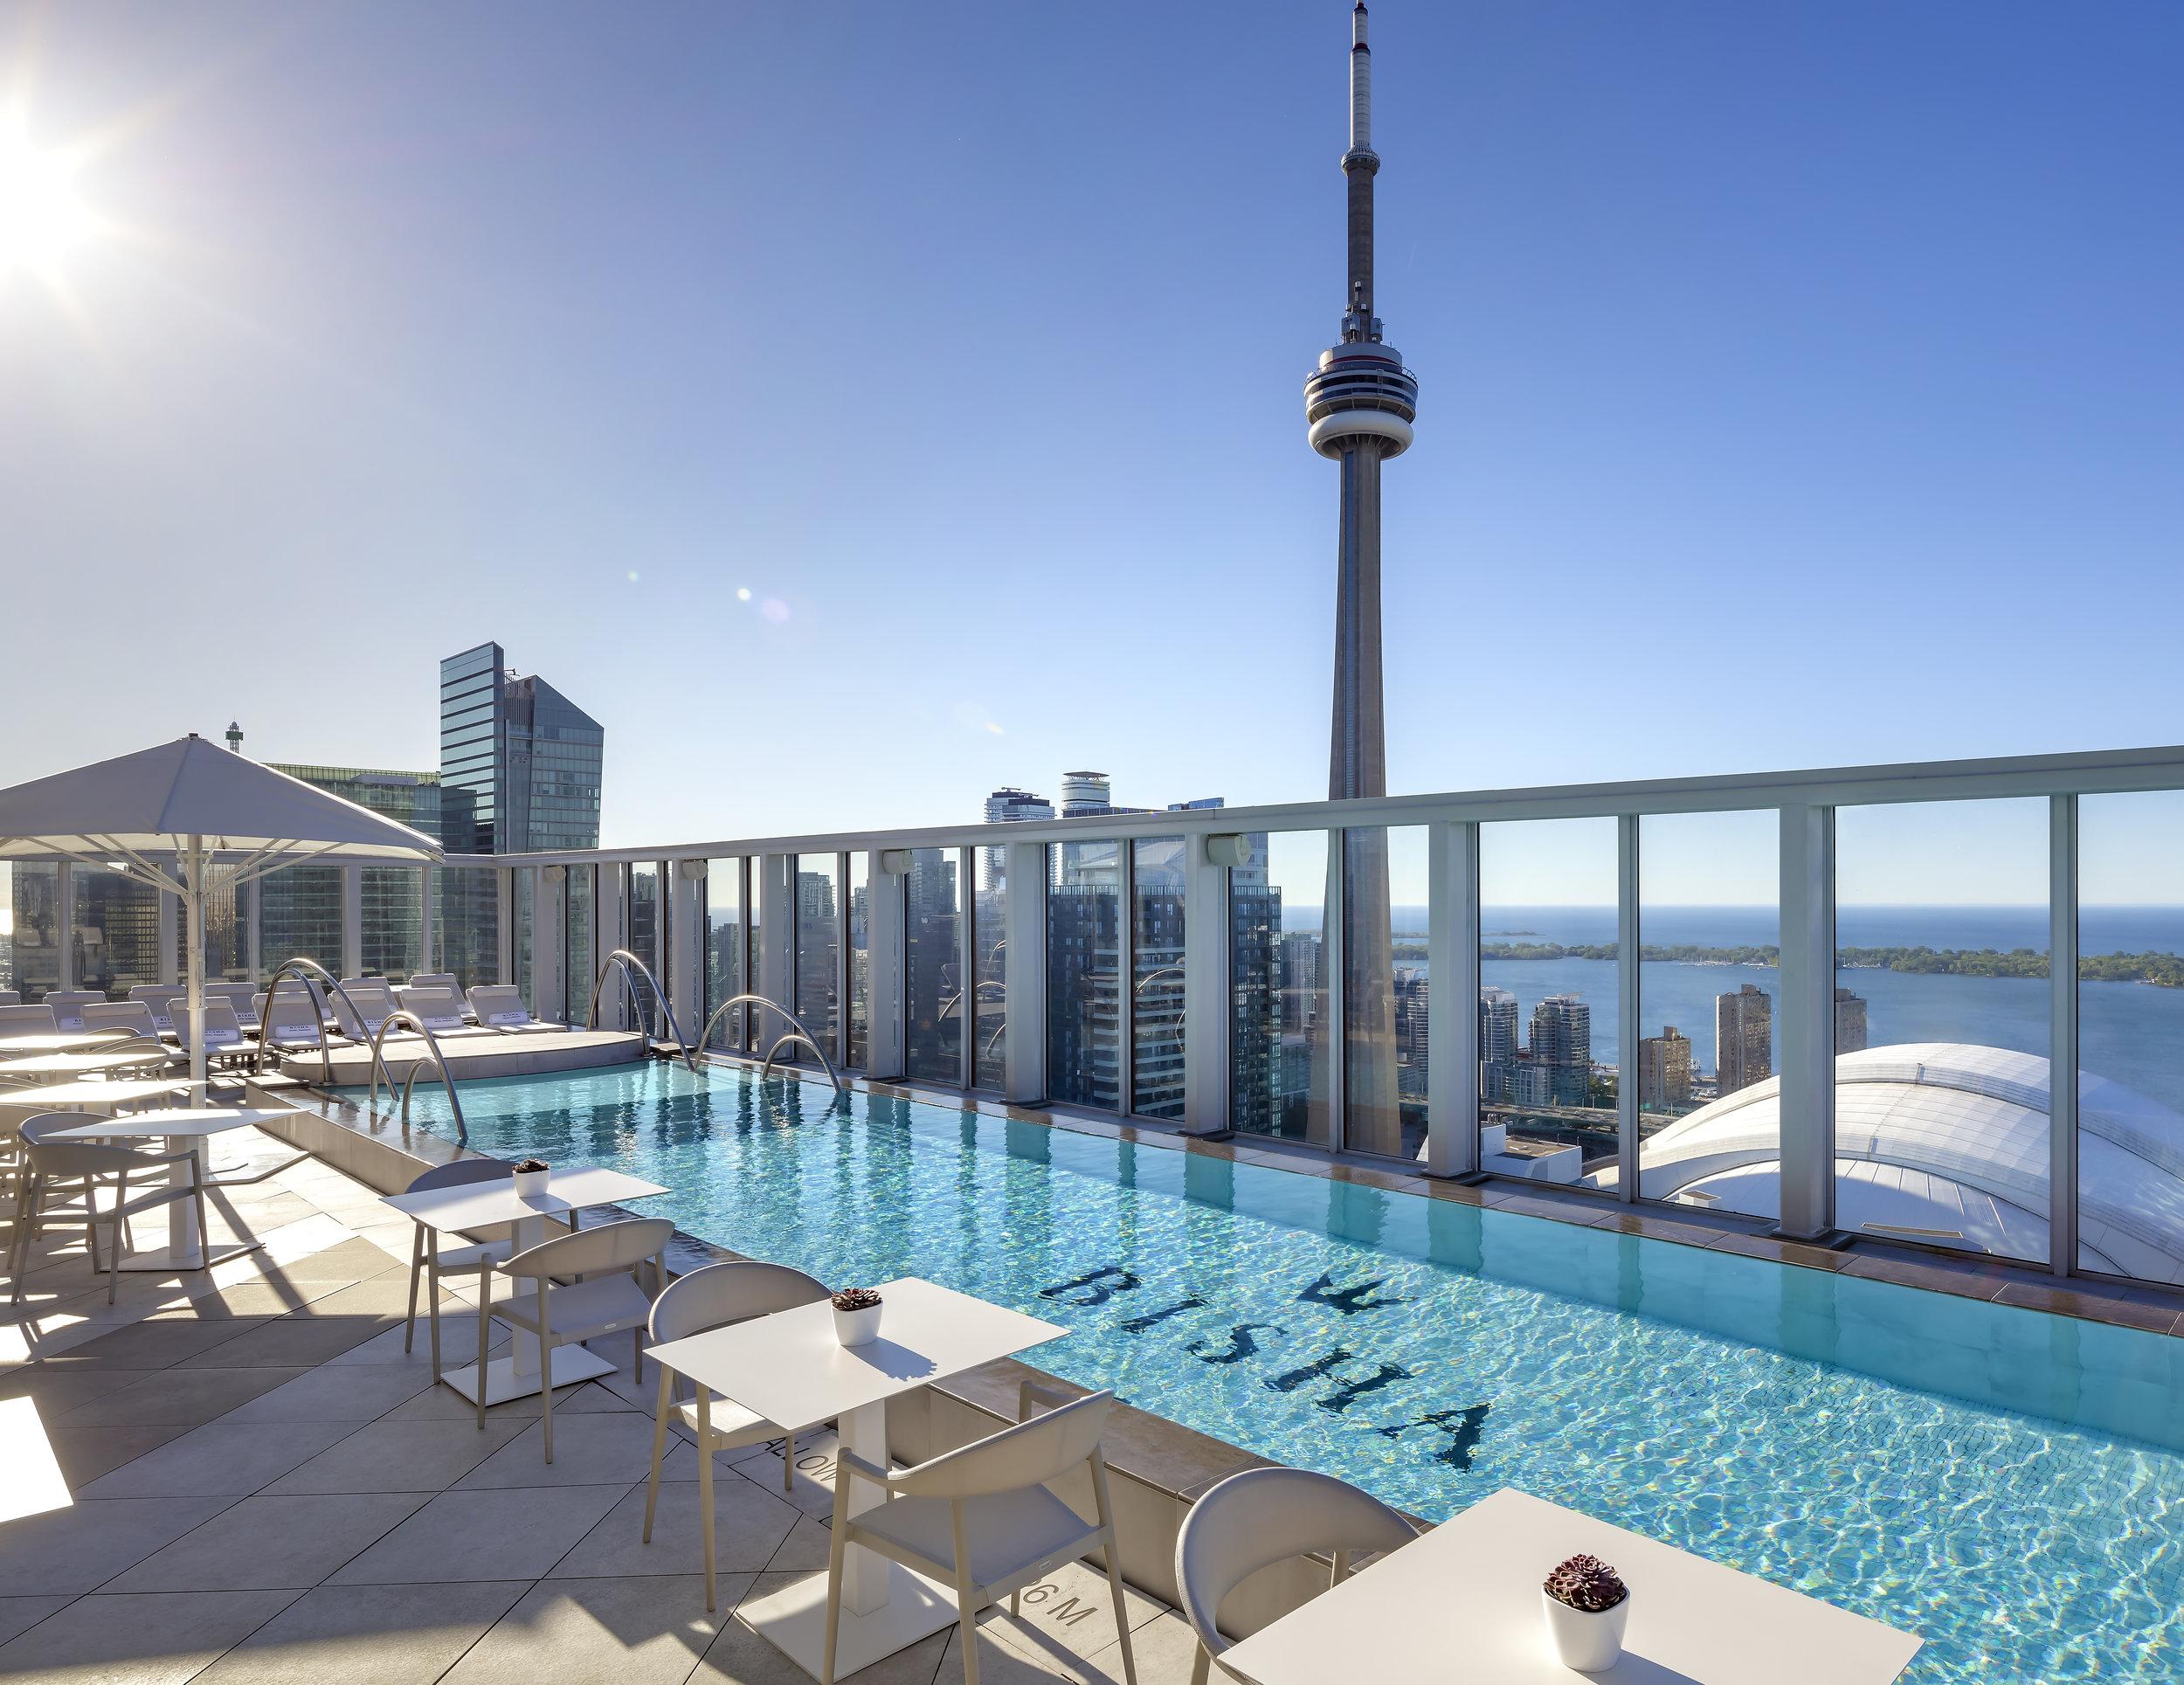 Bisha Hotel Toronto_Rooftop Pool_02_crop.jpg